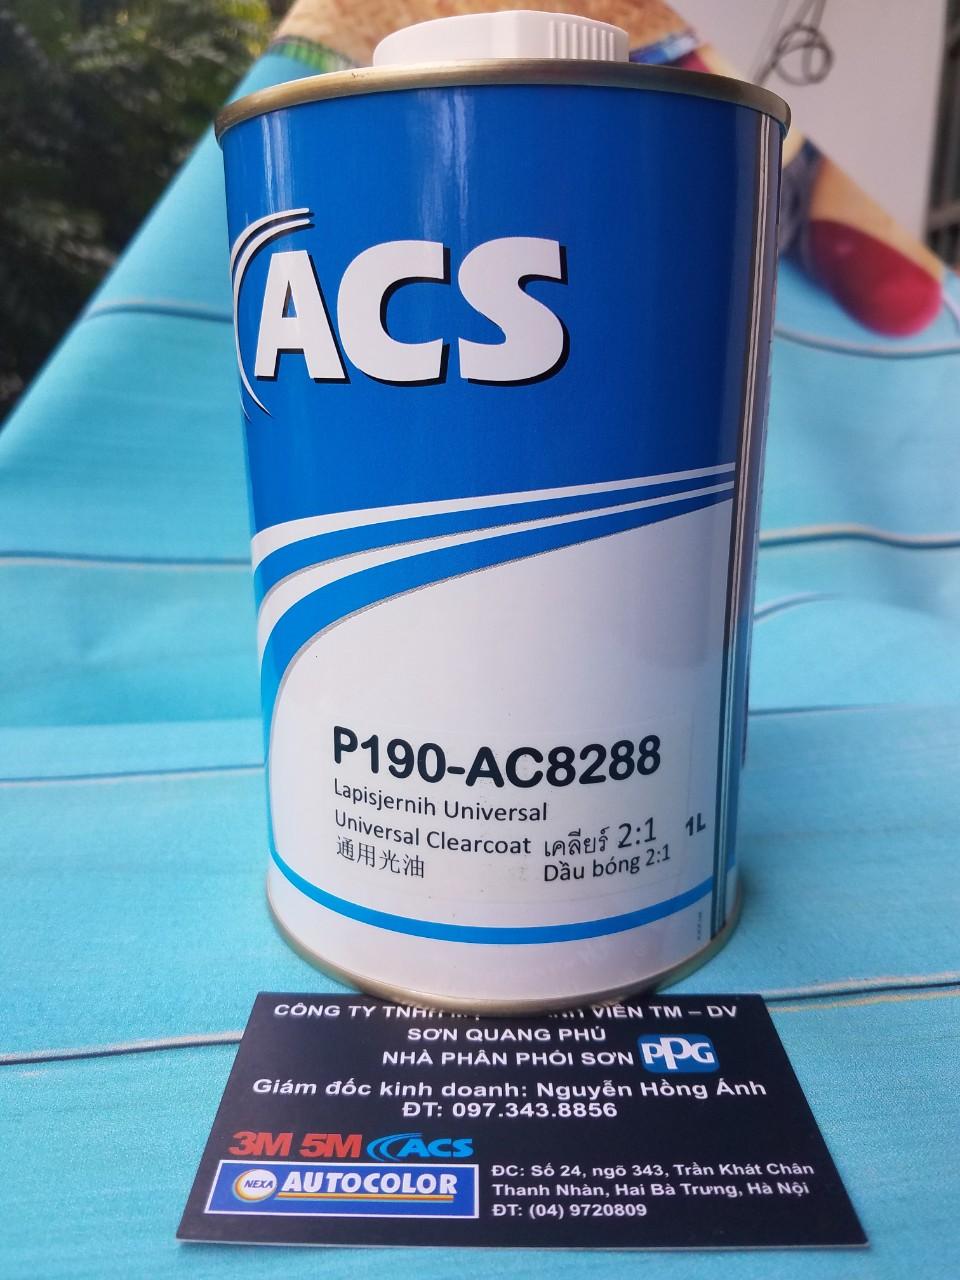 p190-ac8288-dau-bong-2k-acs